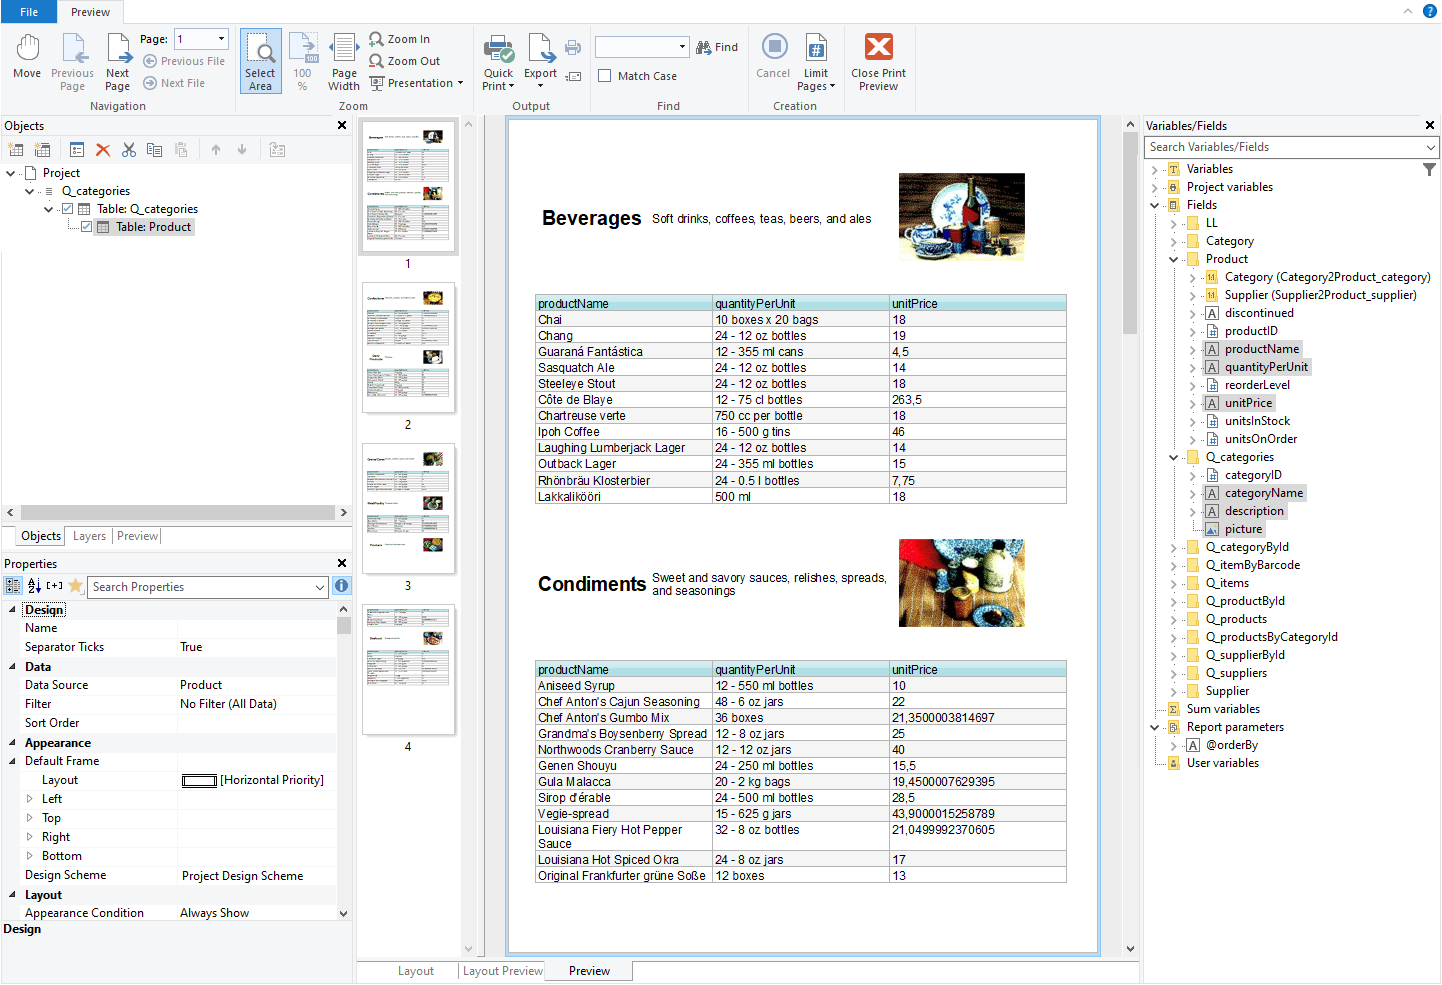 New GraphQL Data Provider for List & Label